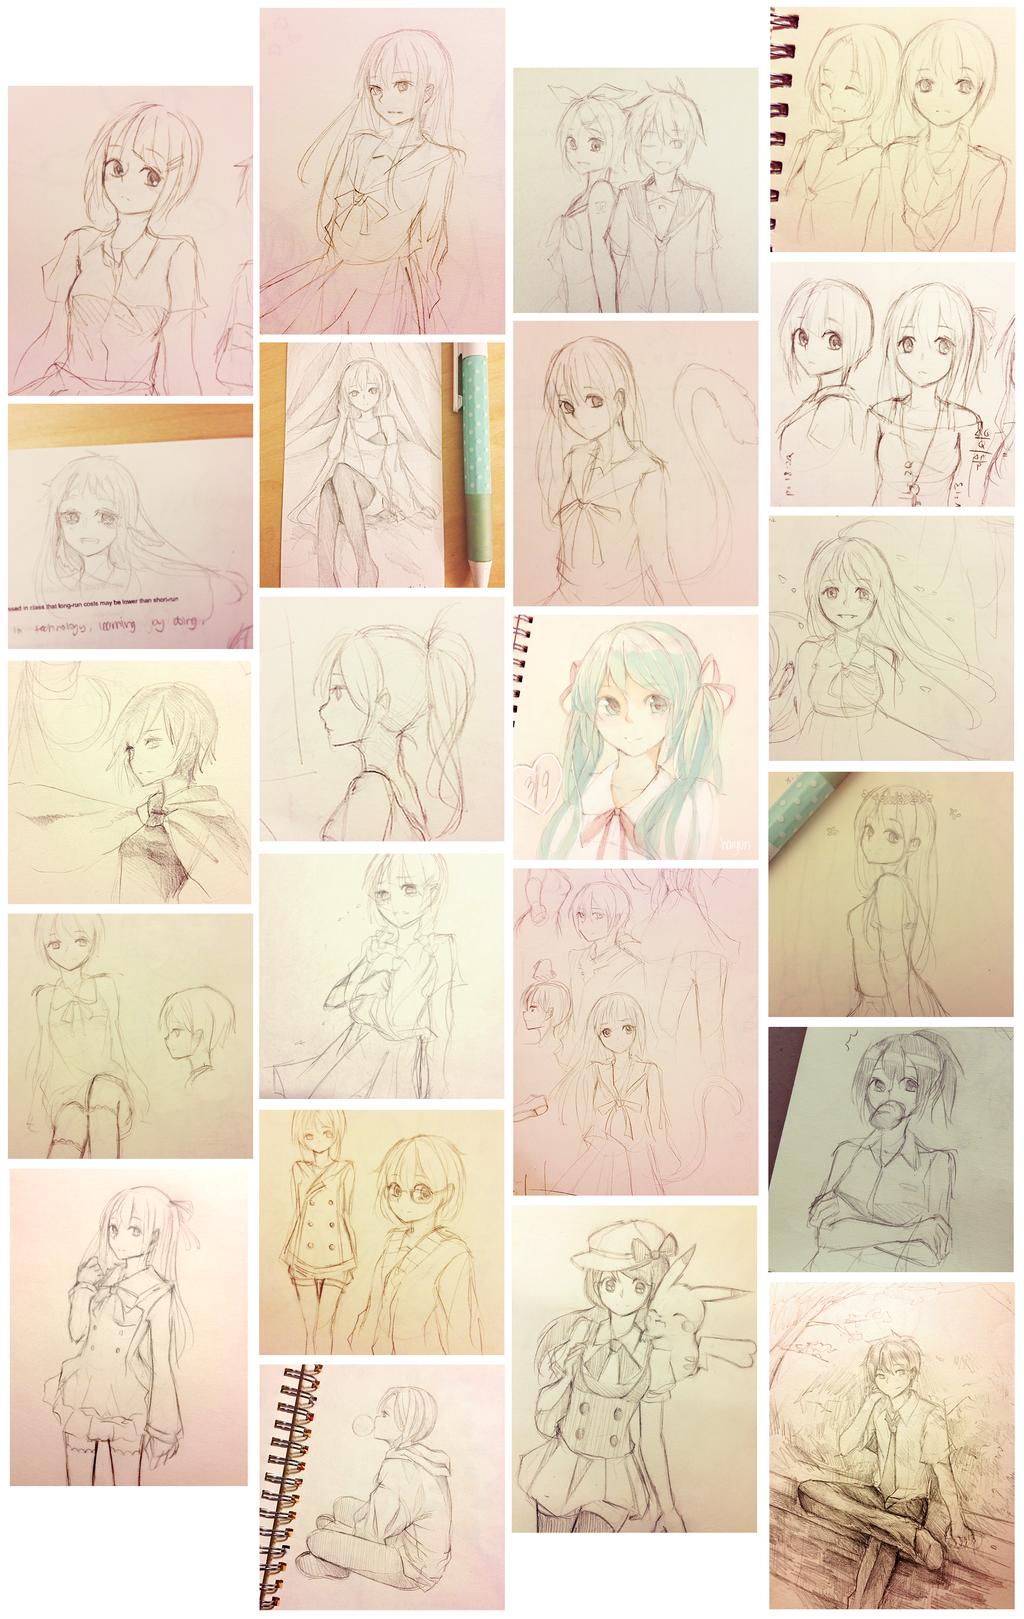 sketchdump by Haiyun